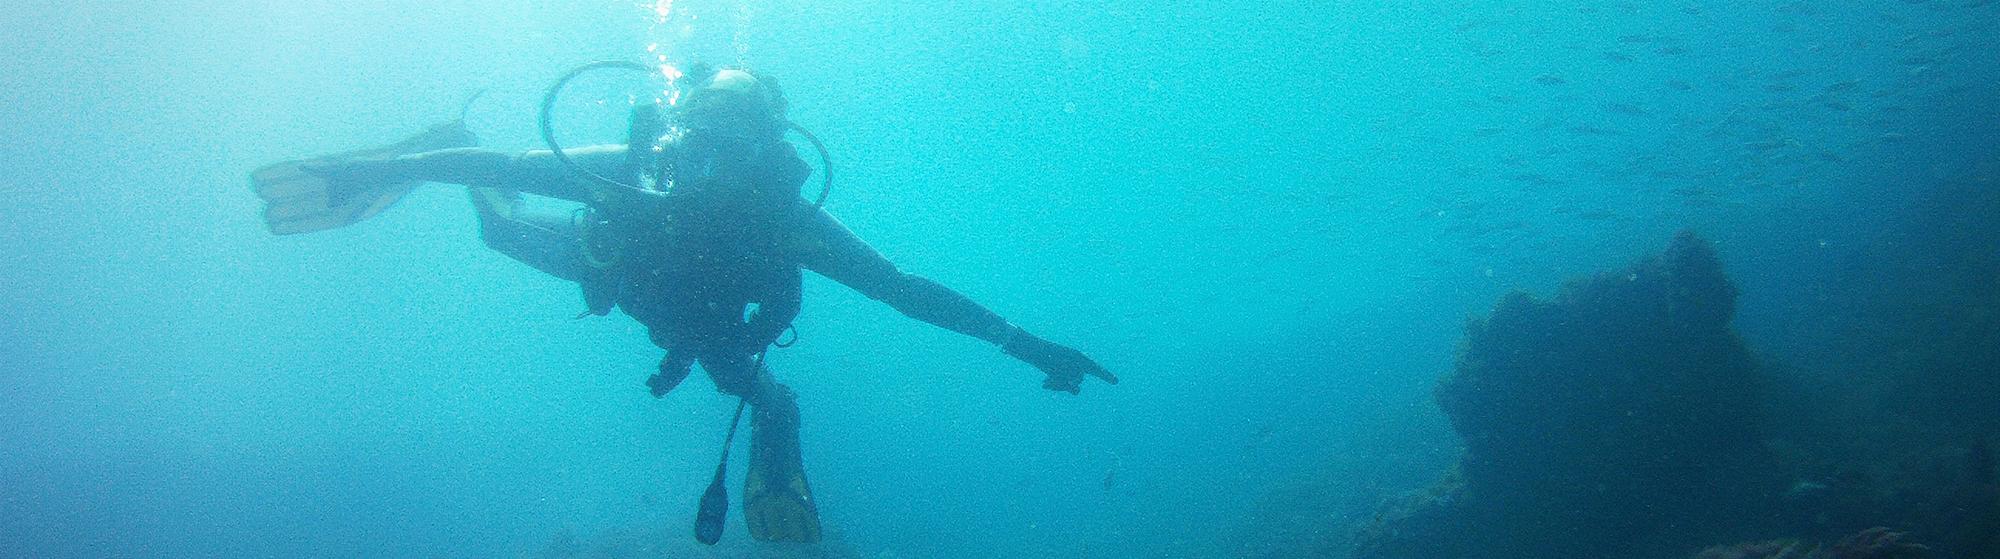 buceo en Zahara de los Atunes, discover scuba diving